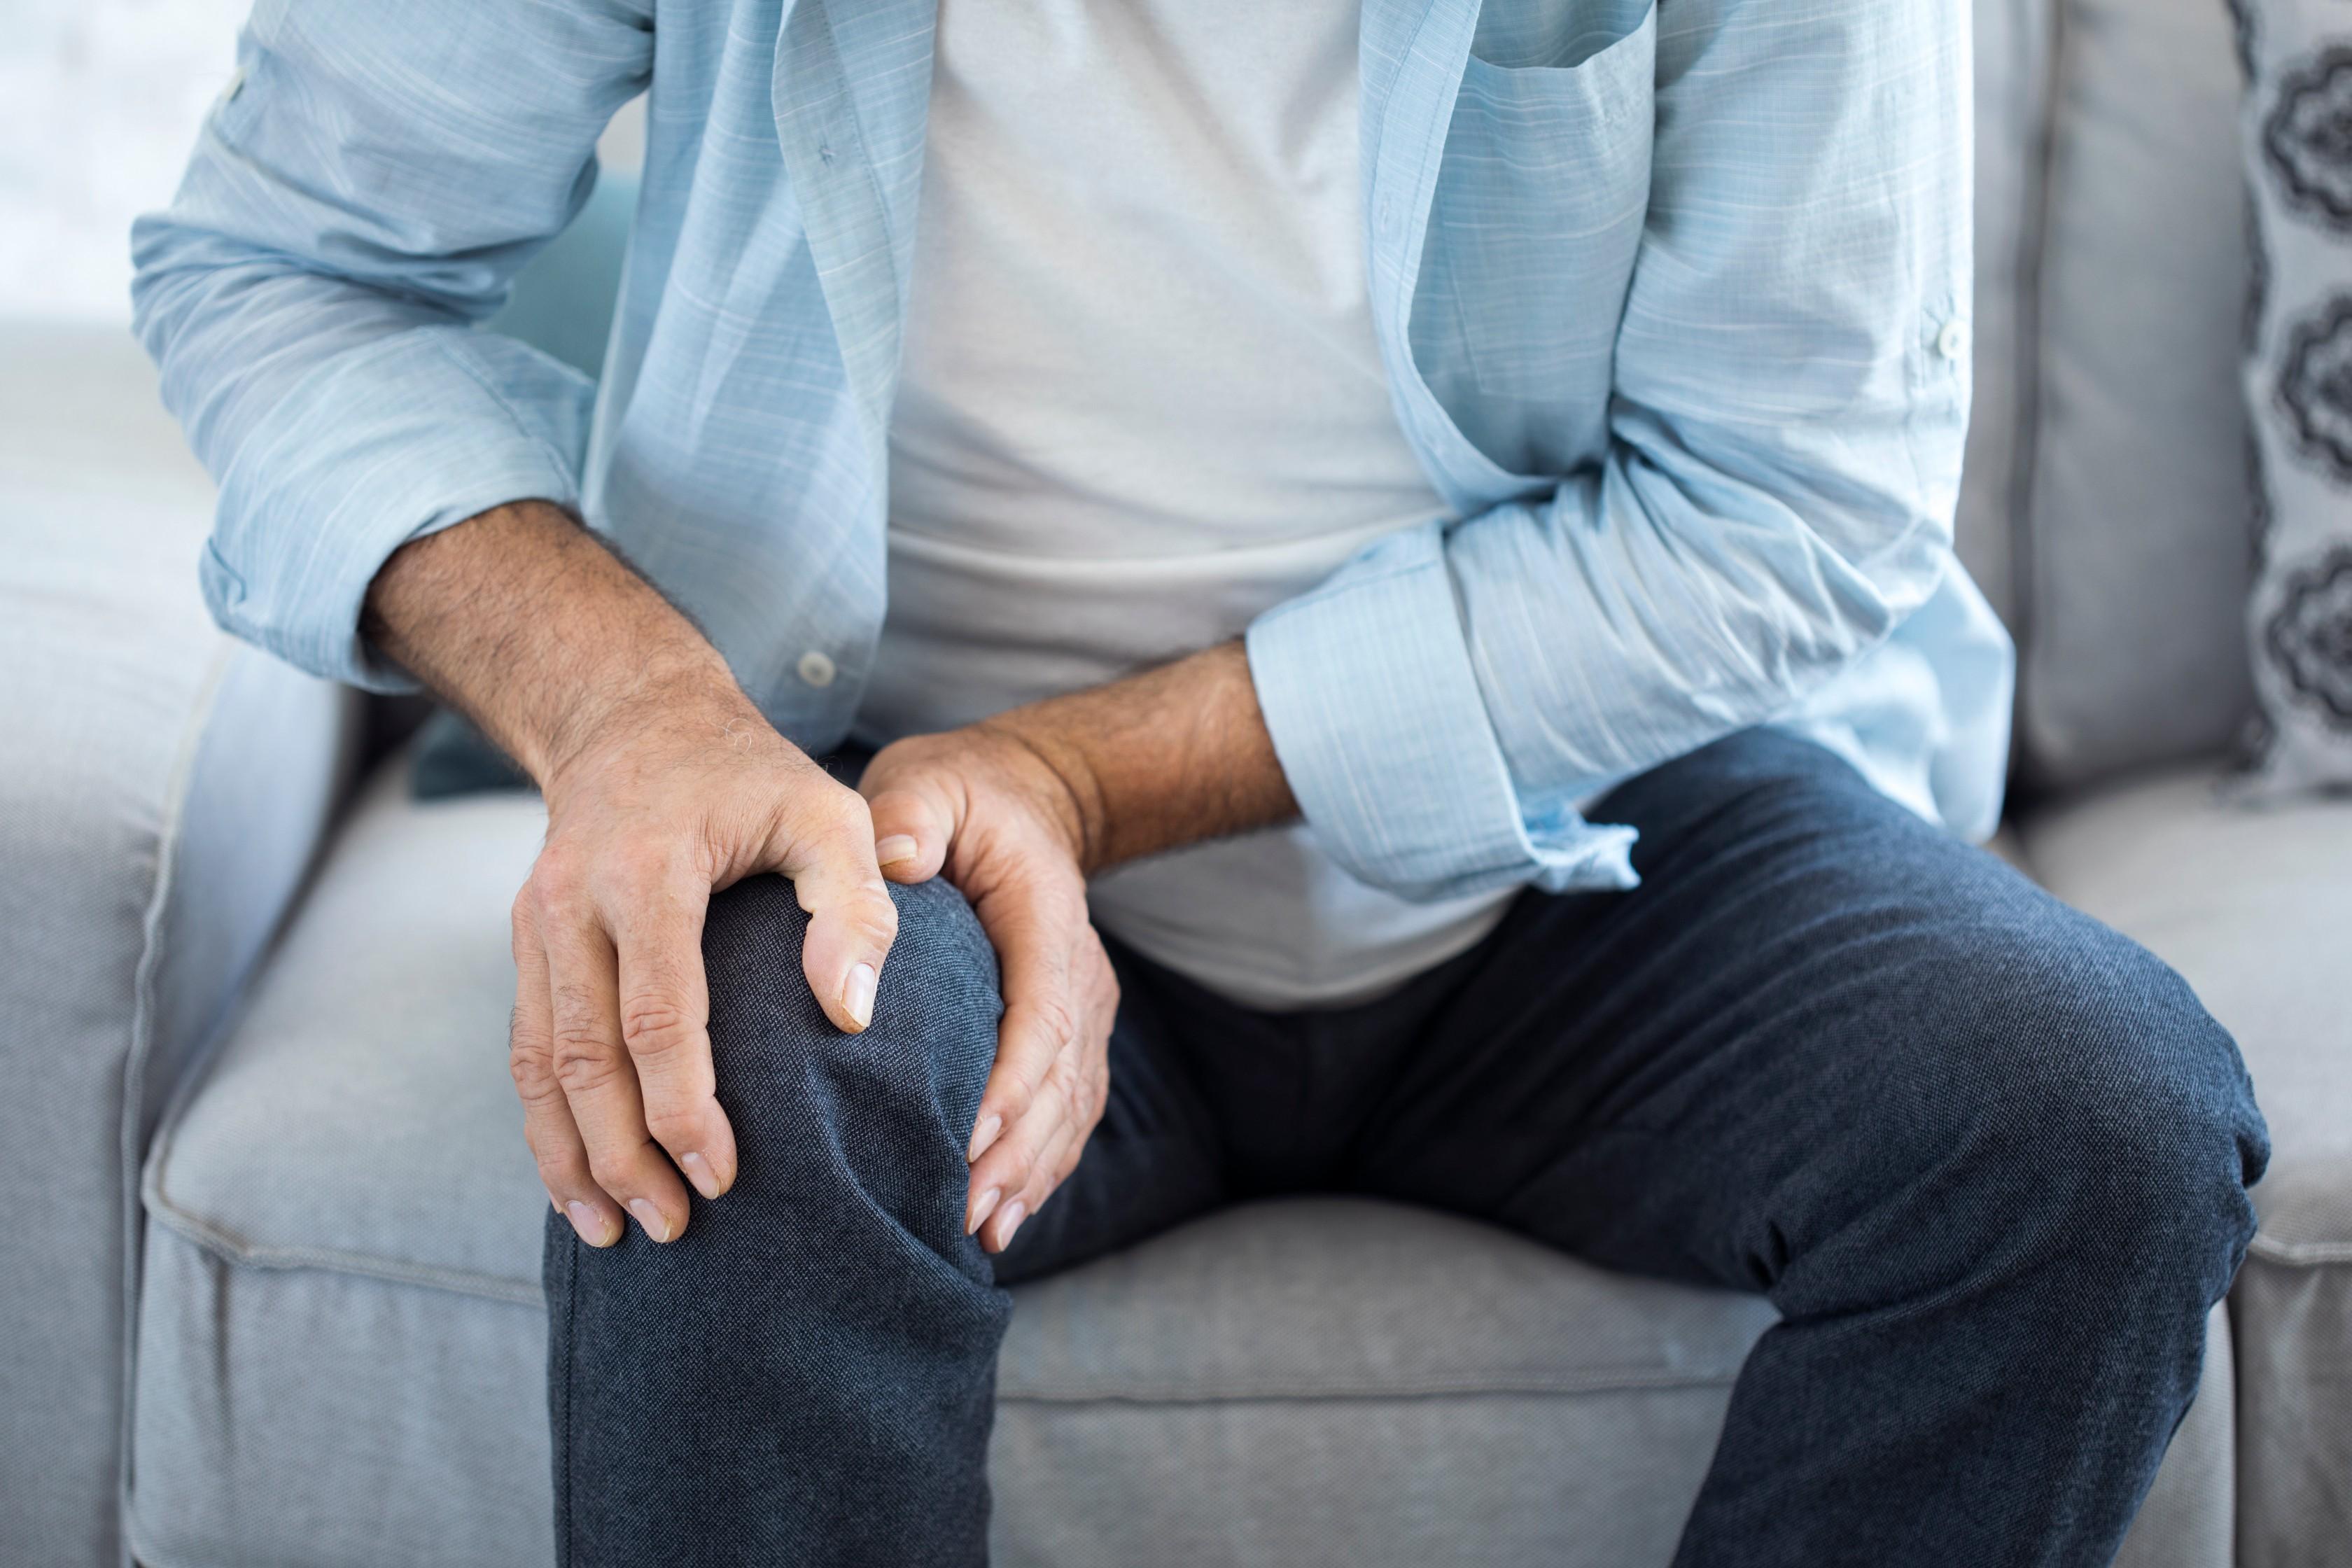 gyakorlatok ízületi fájdalomra